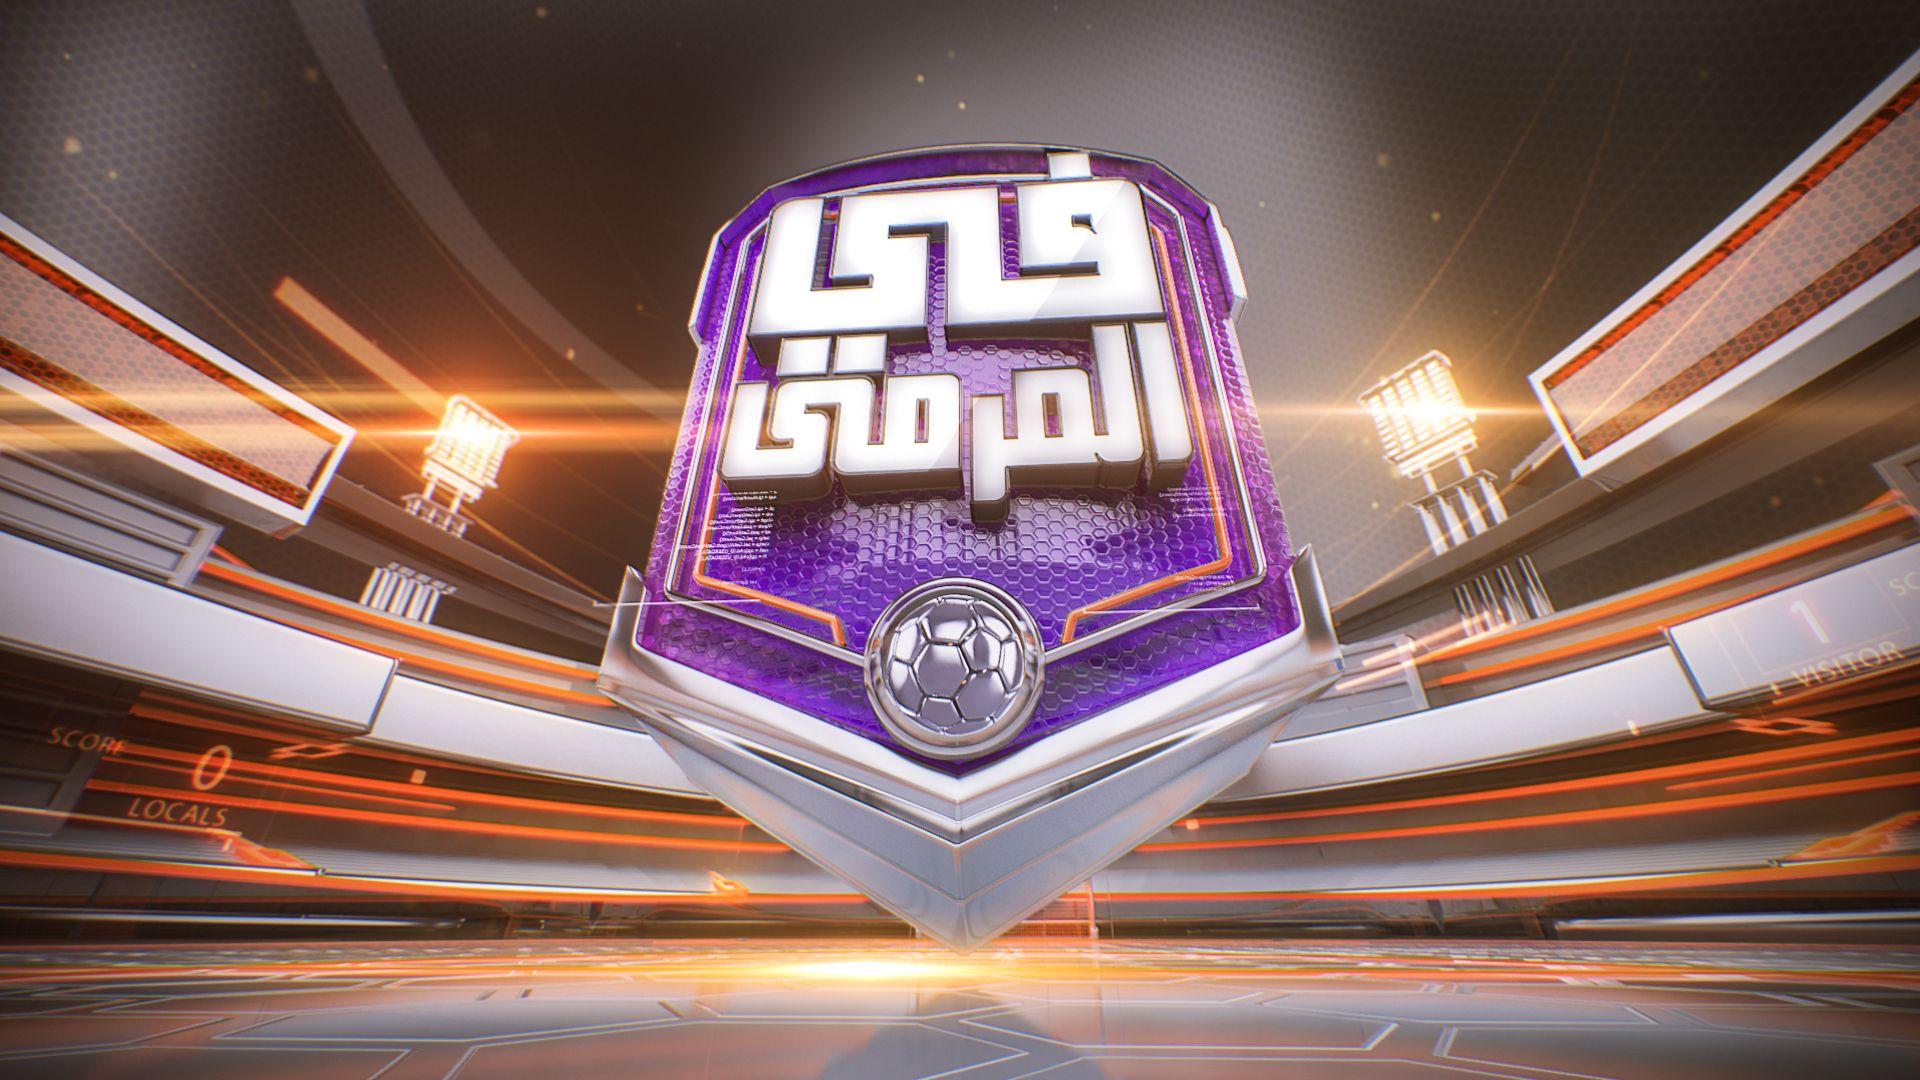 Rebranding for the Al Arabiya Sport program Fil